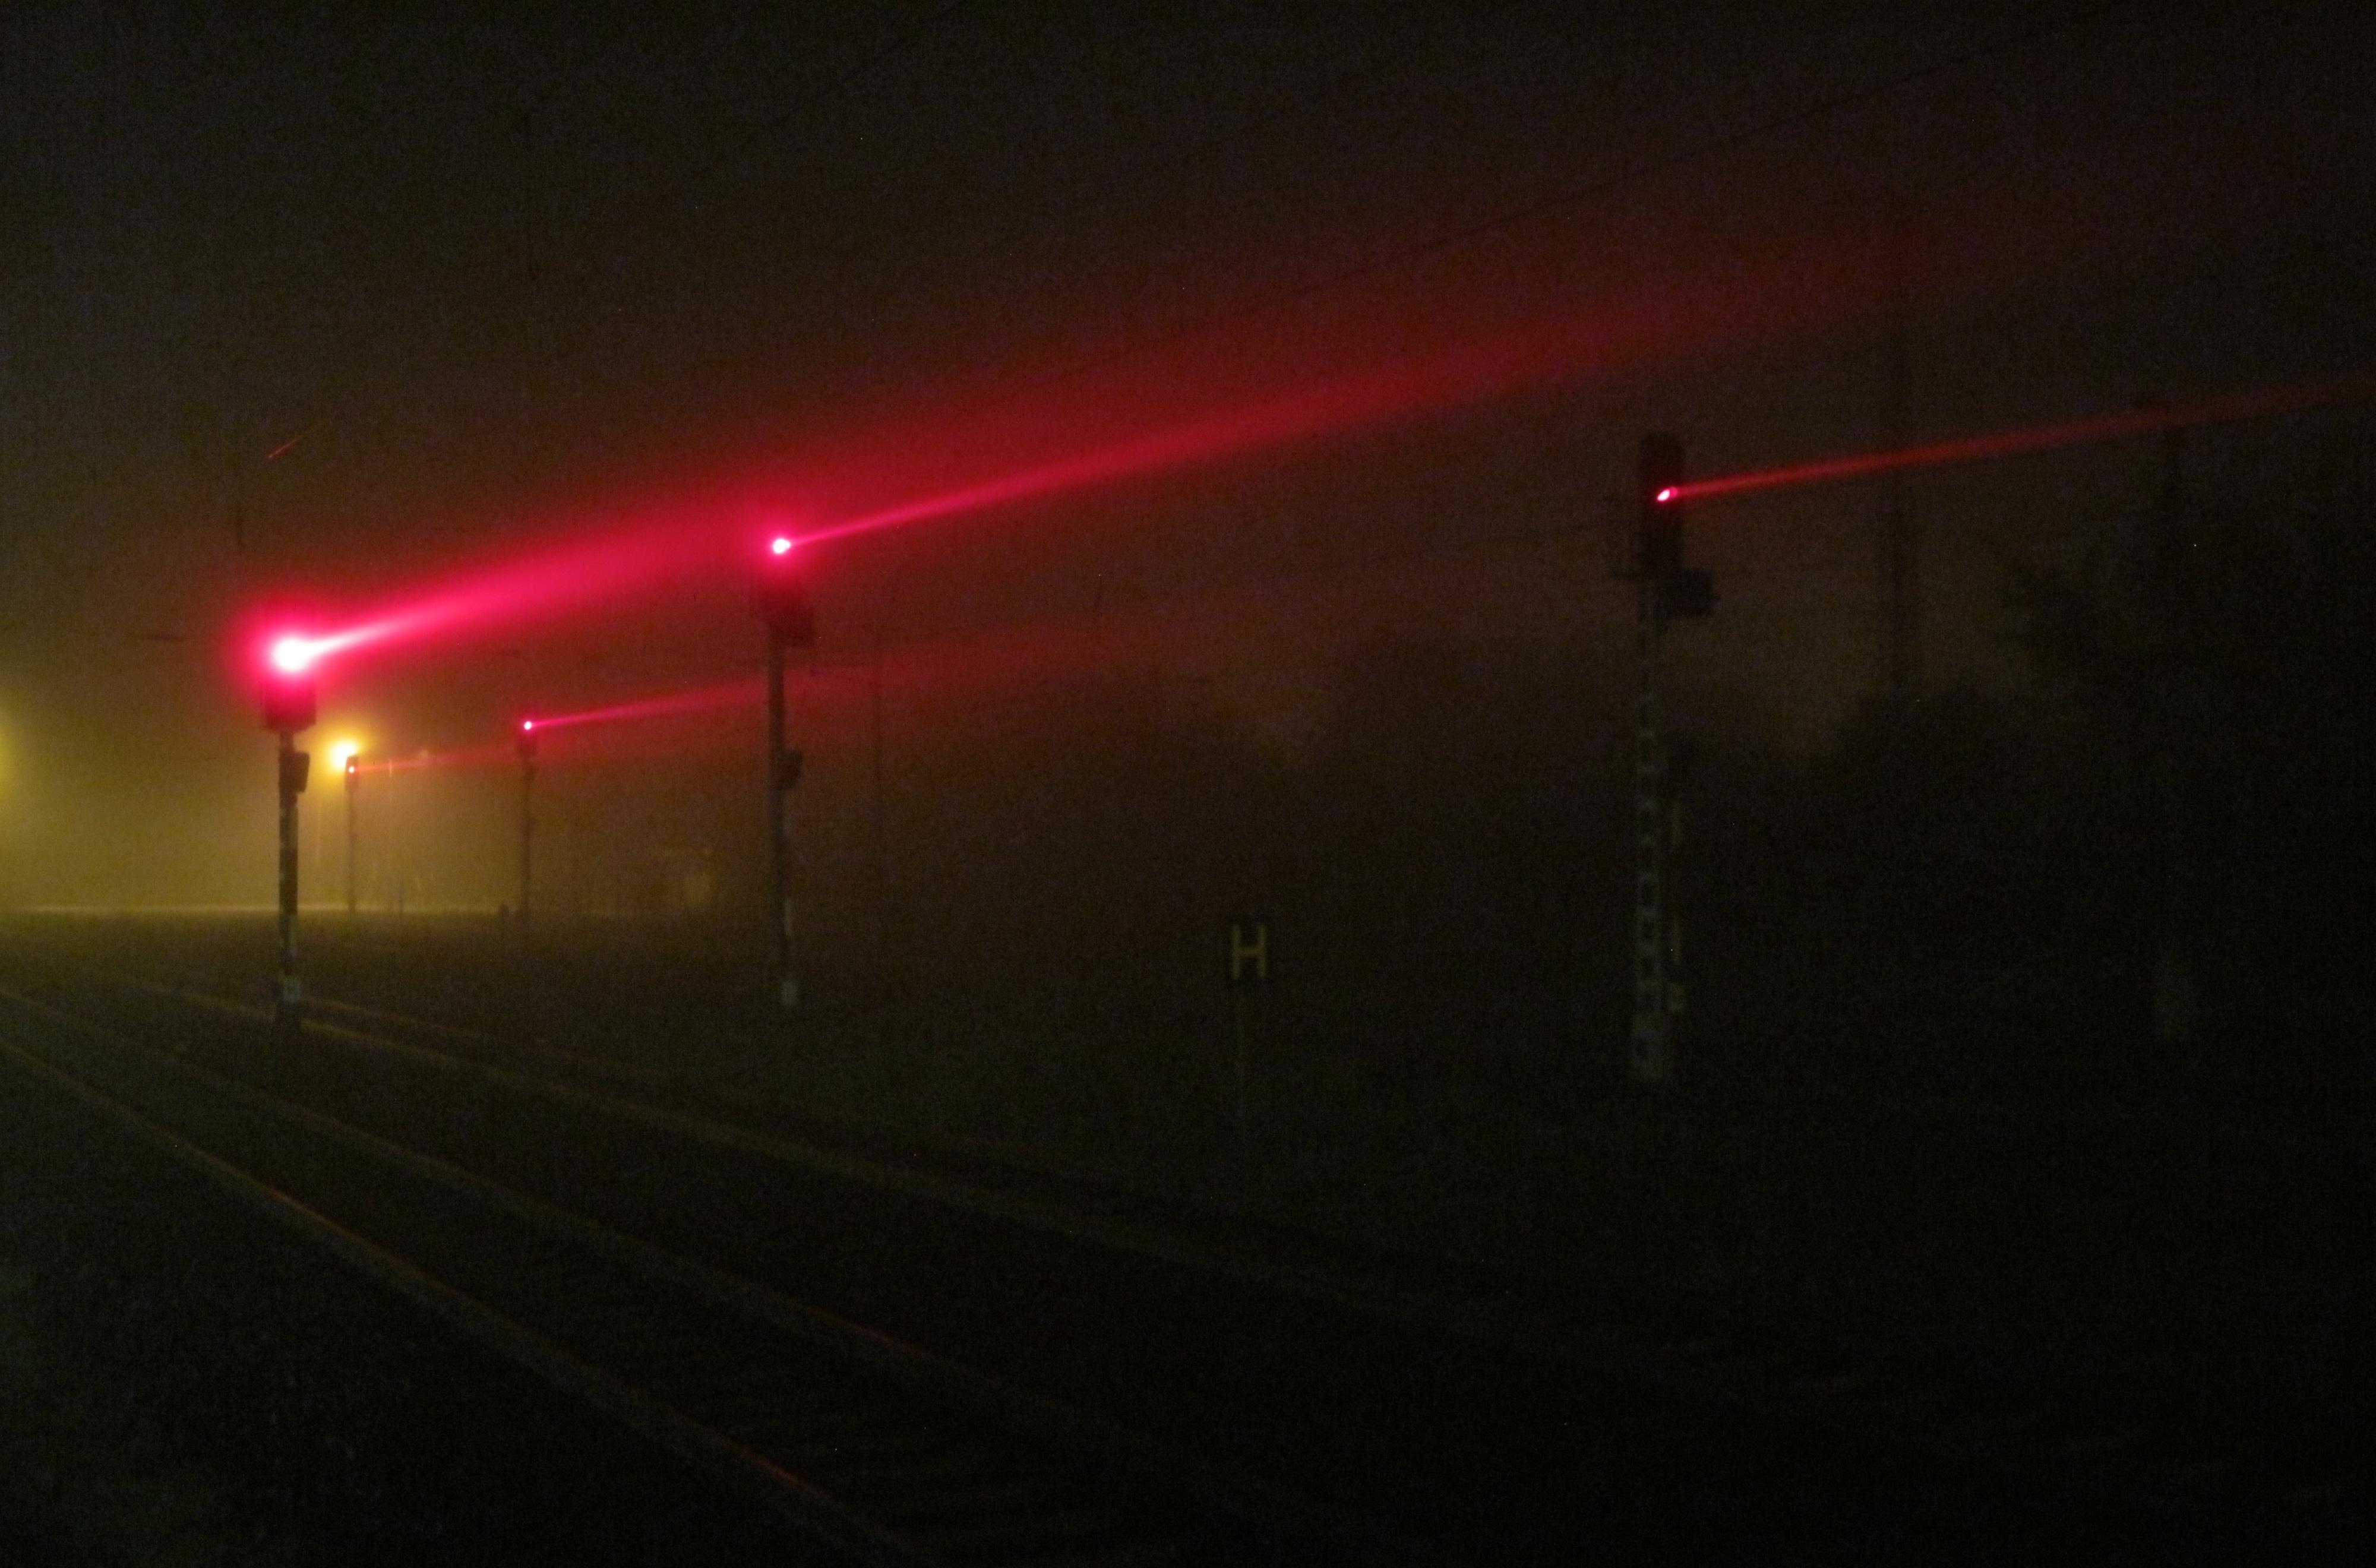 File:Railway signals beaming through ground fog at night jpg